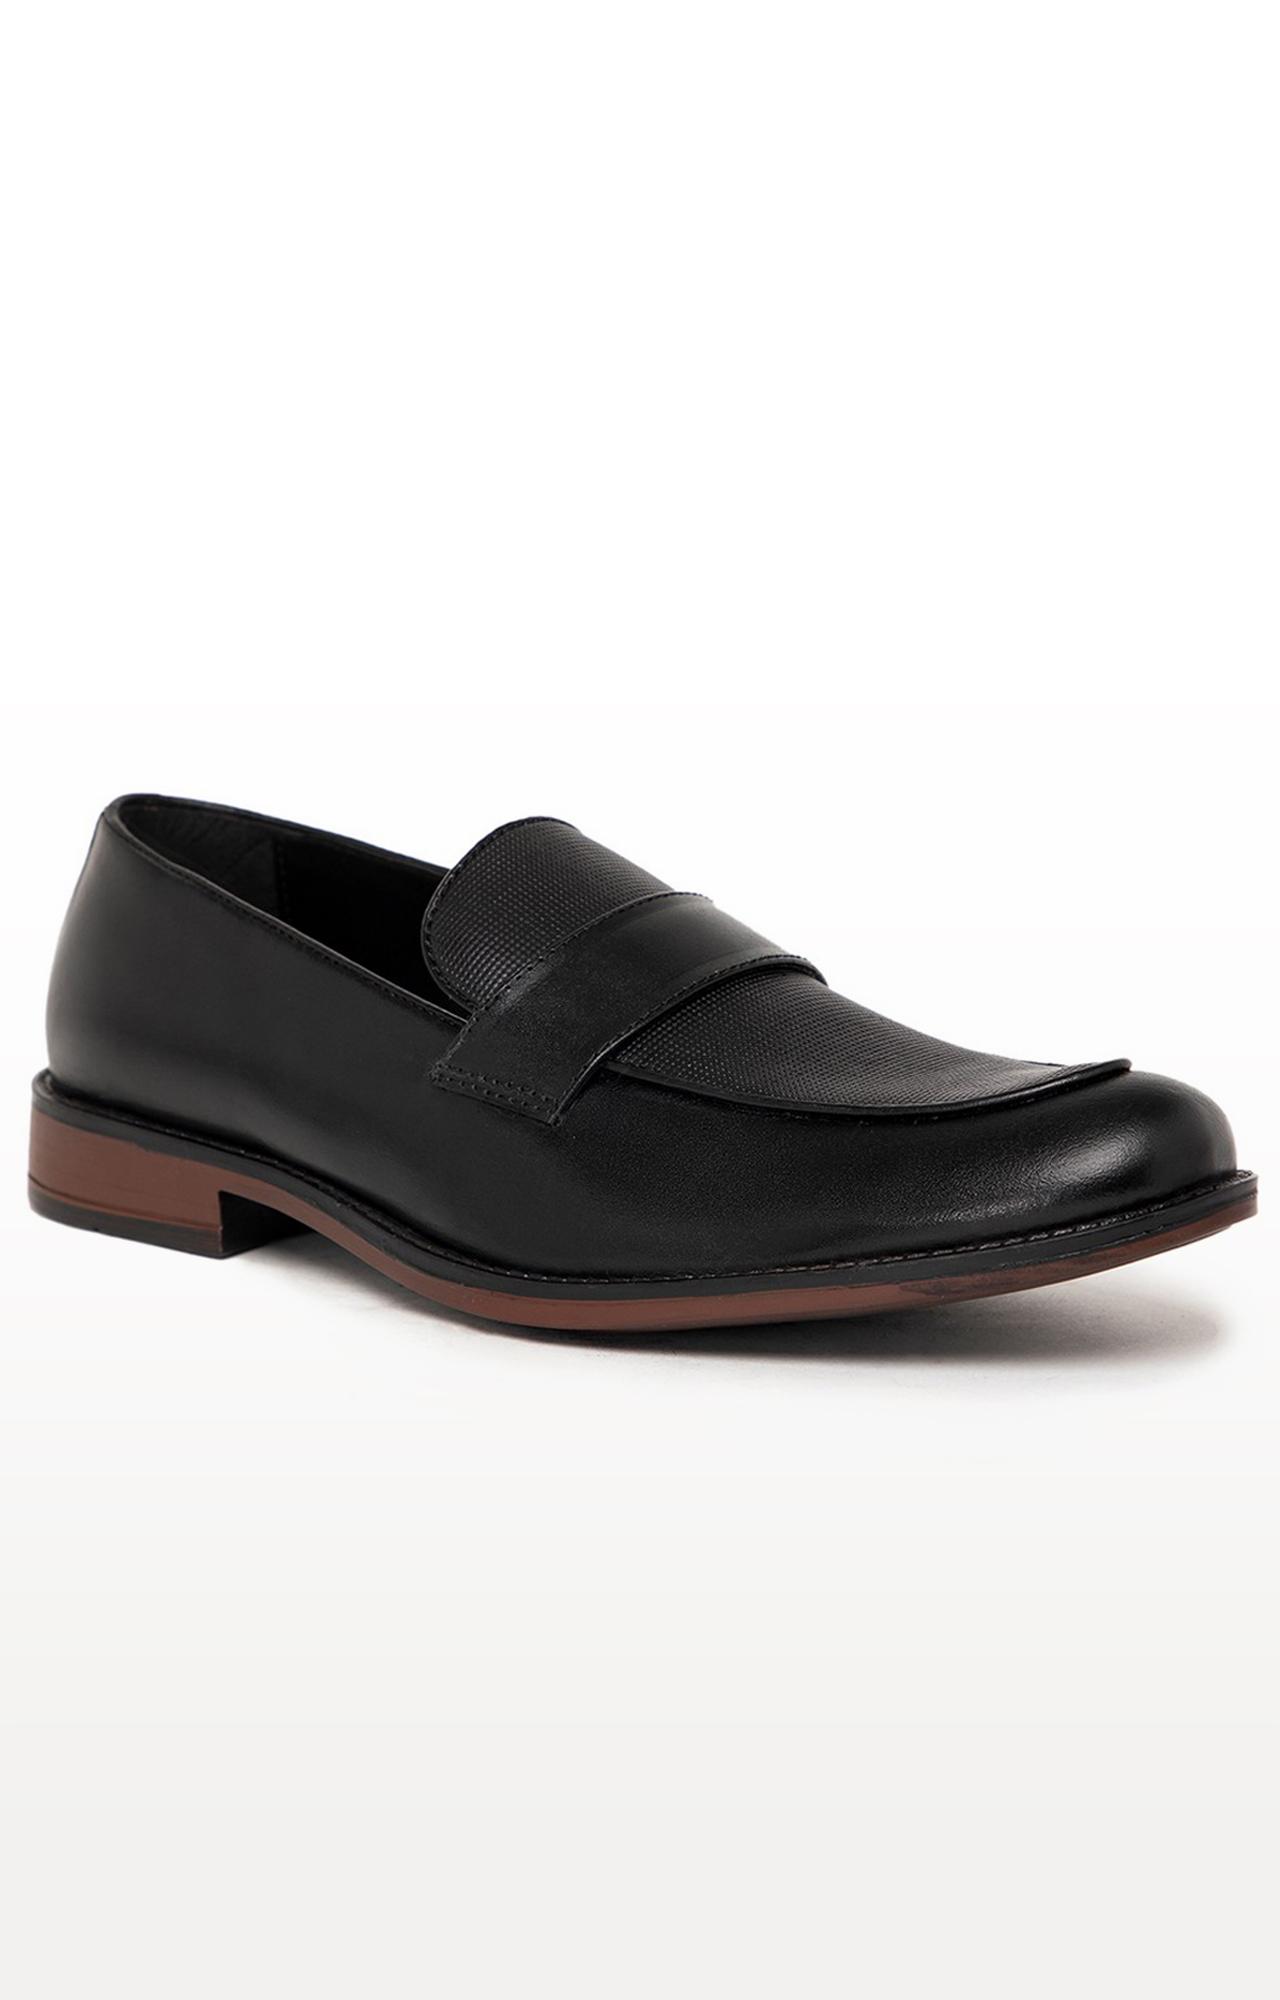 Noble Curve | Black Formal Loafers